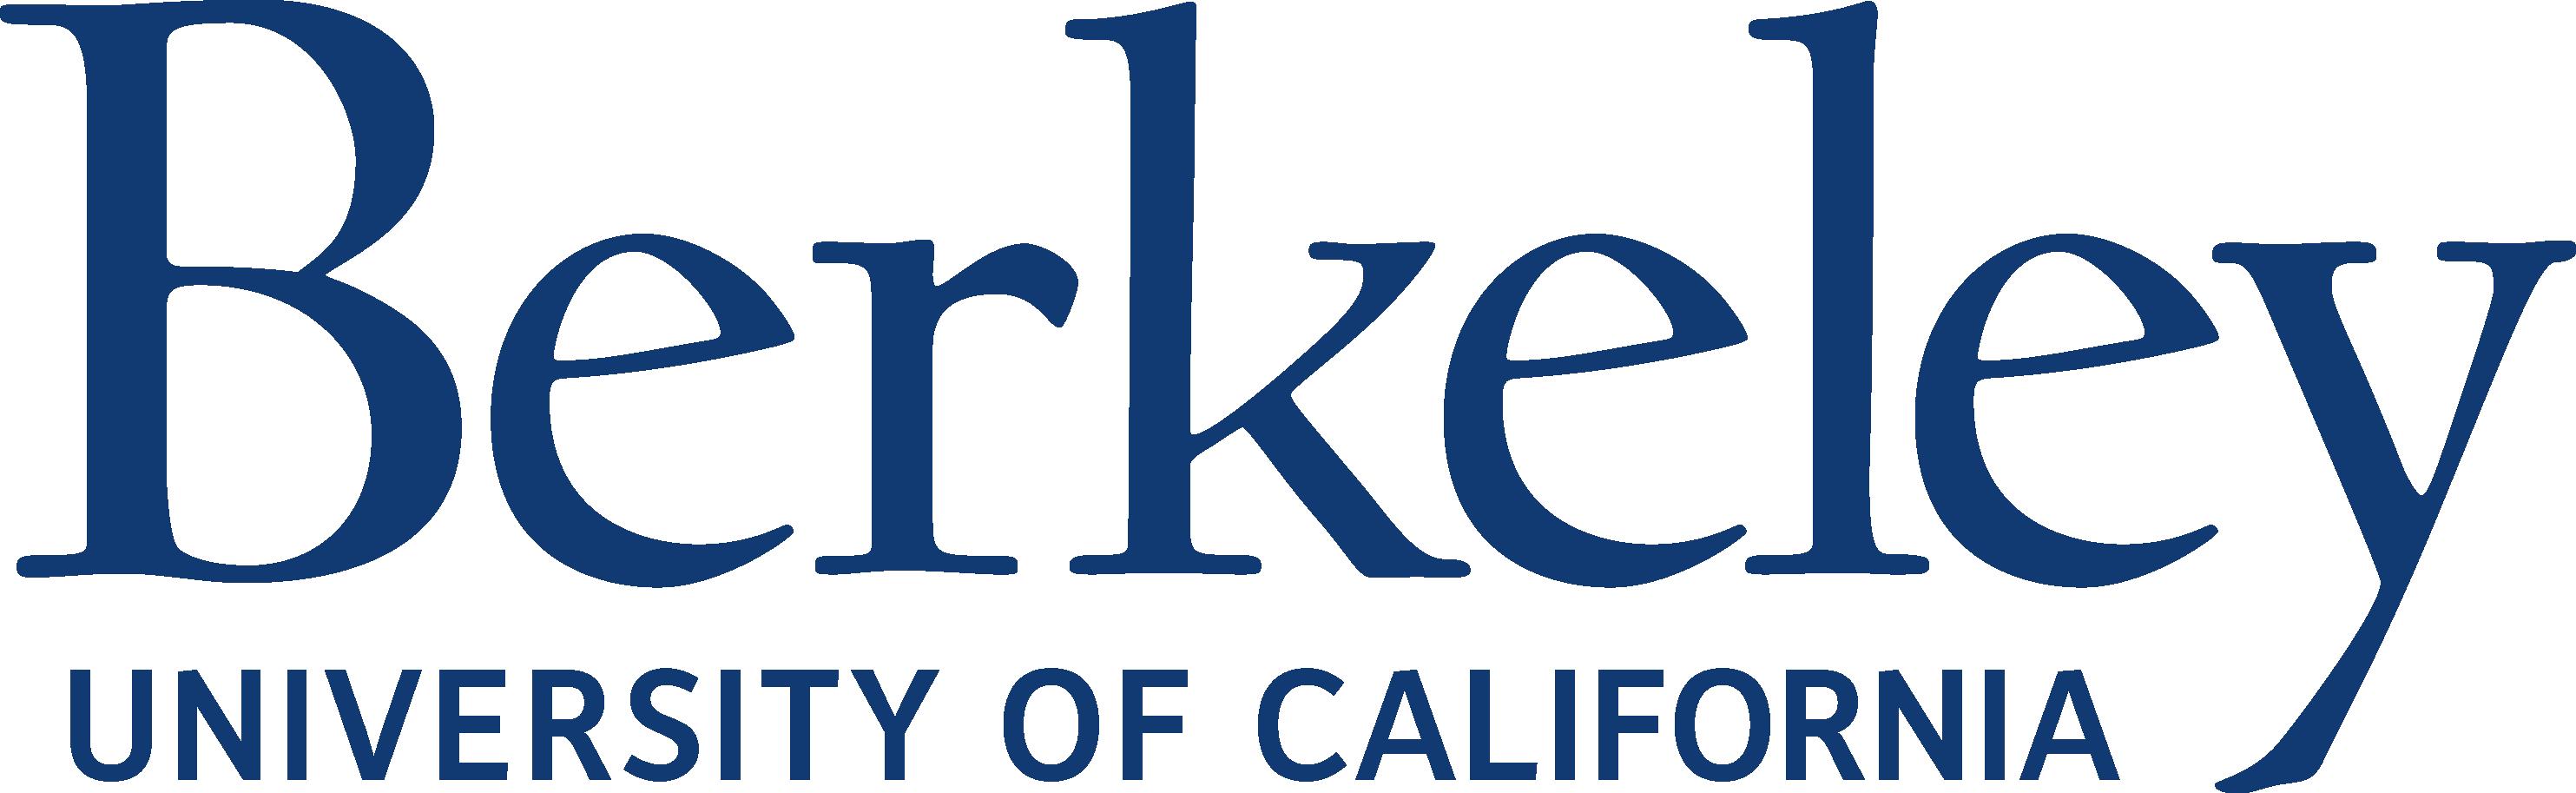 University of California Berkeley - UC Berkeley